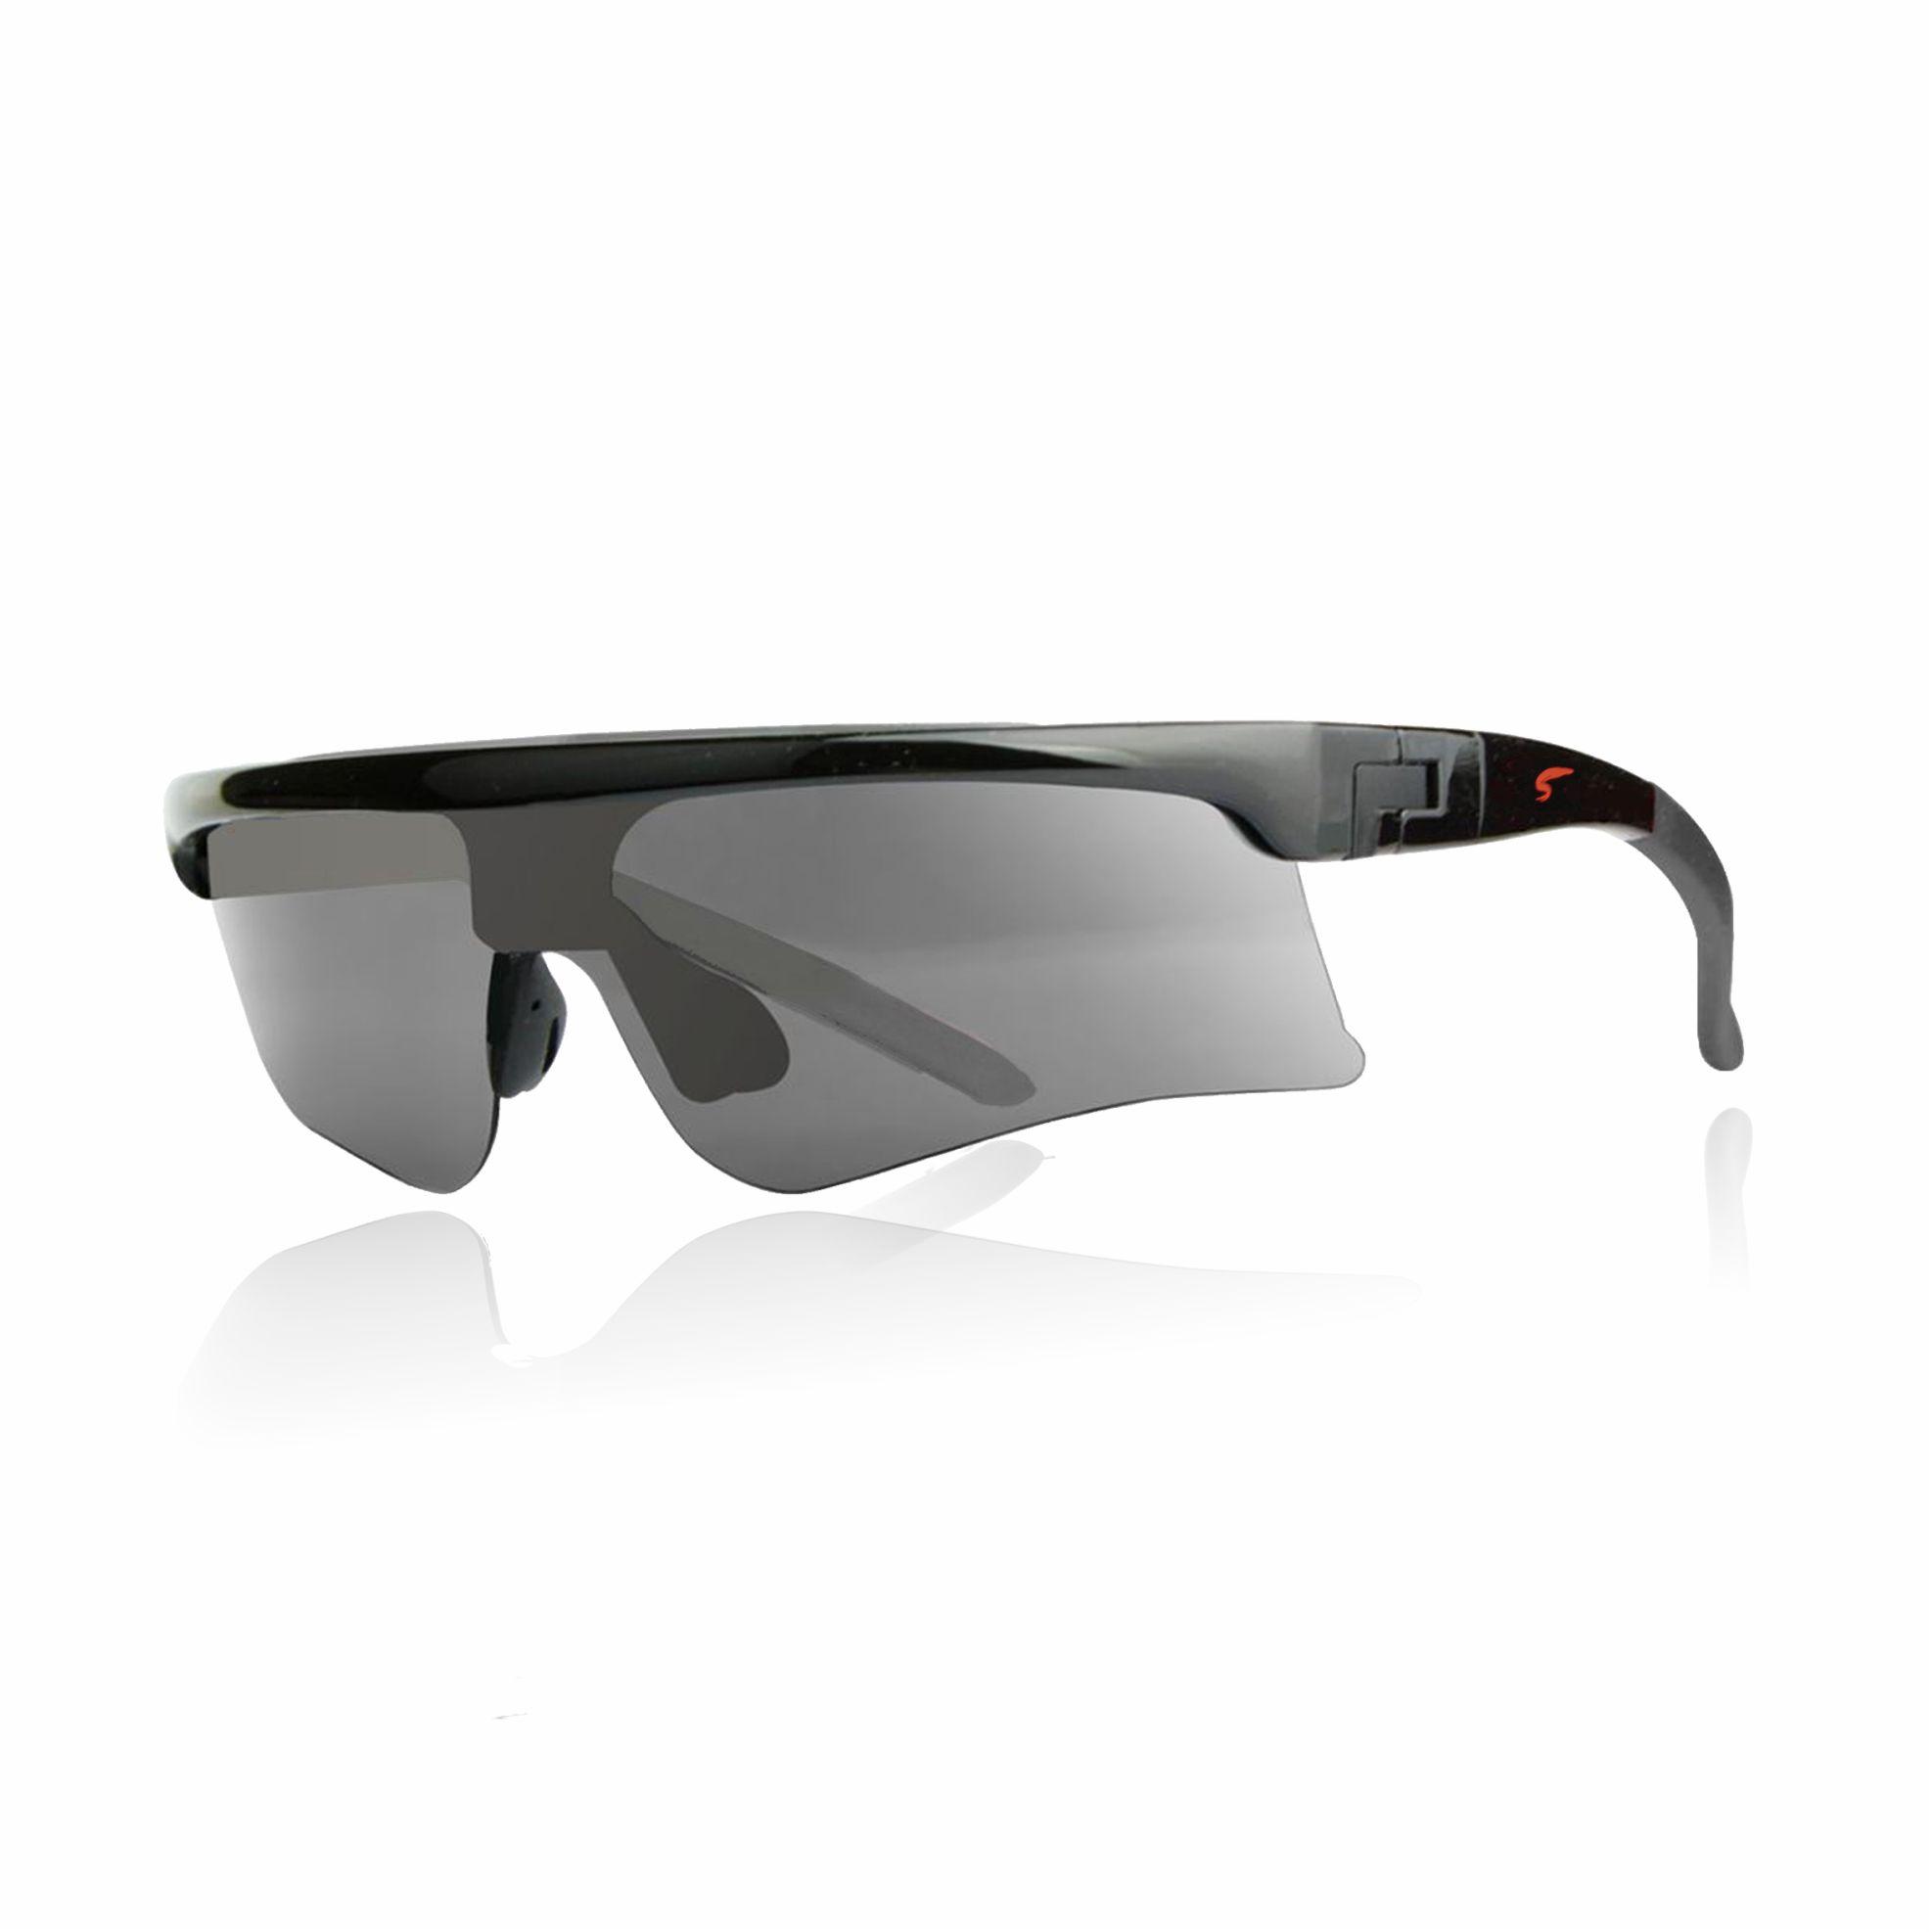 Sacuba Self-Clean Sunglasses